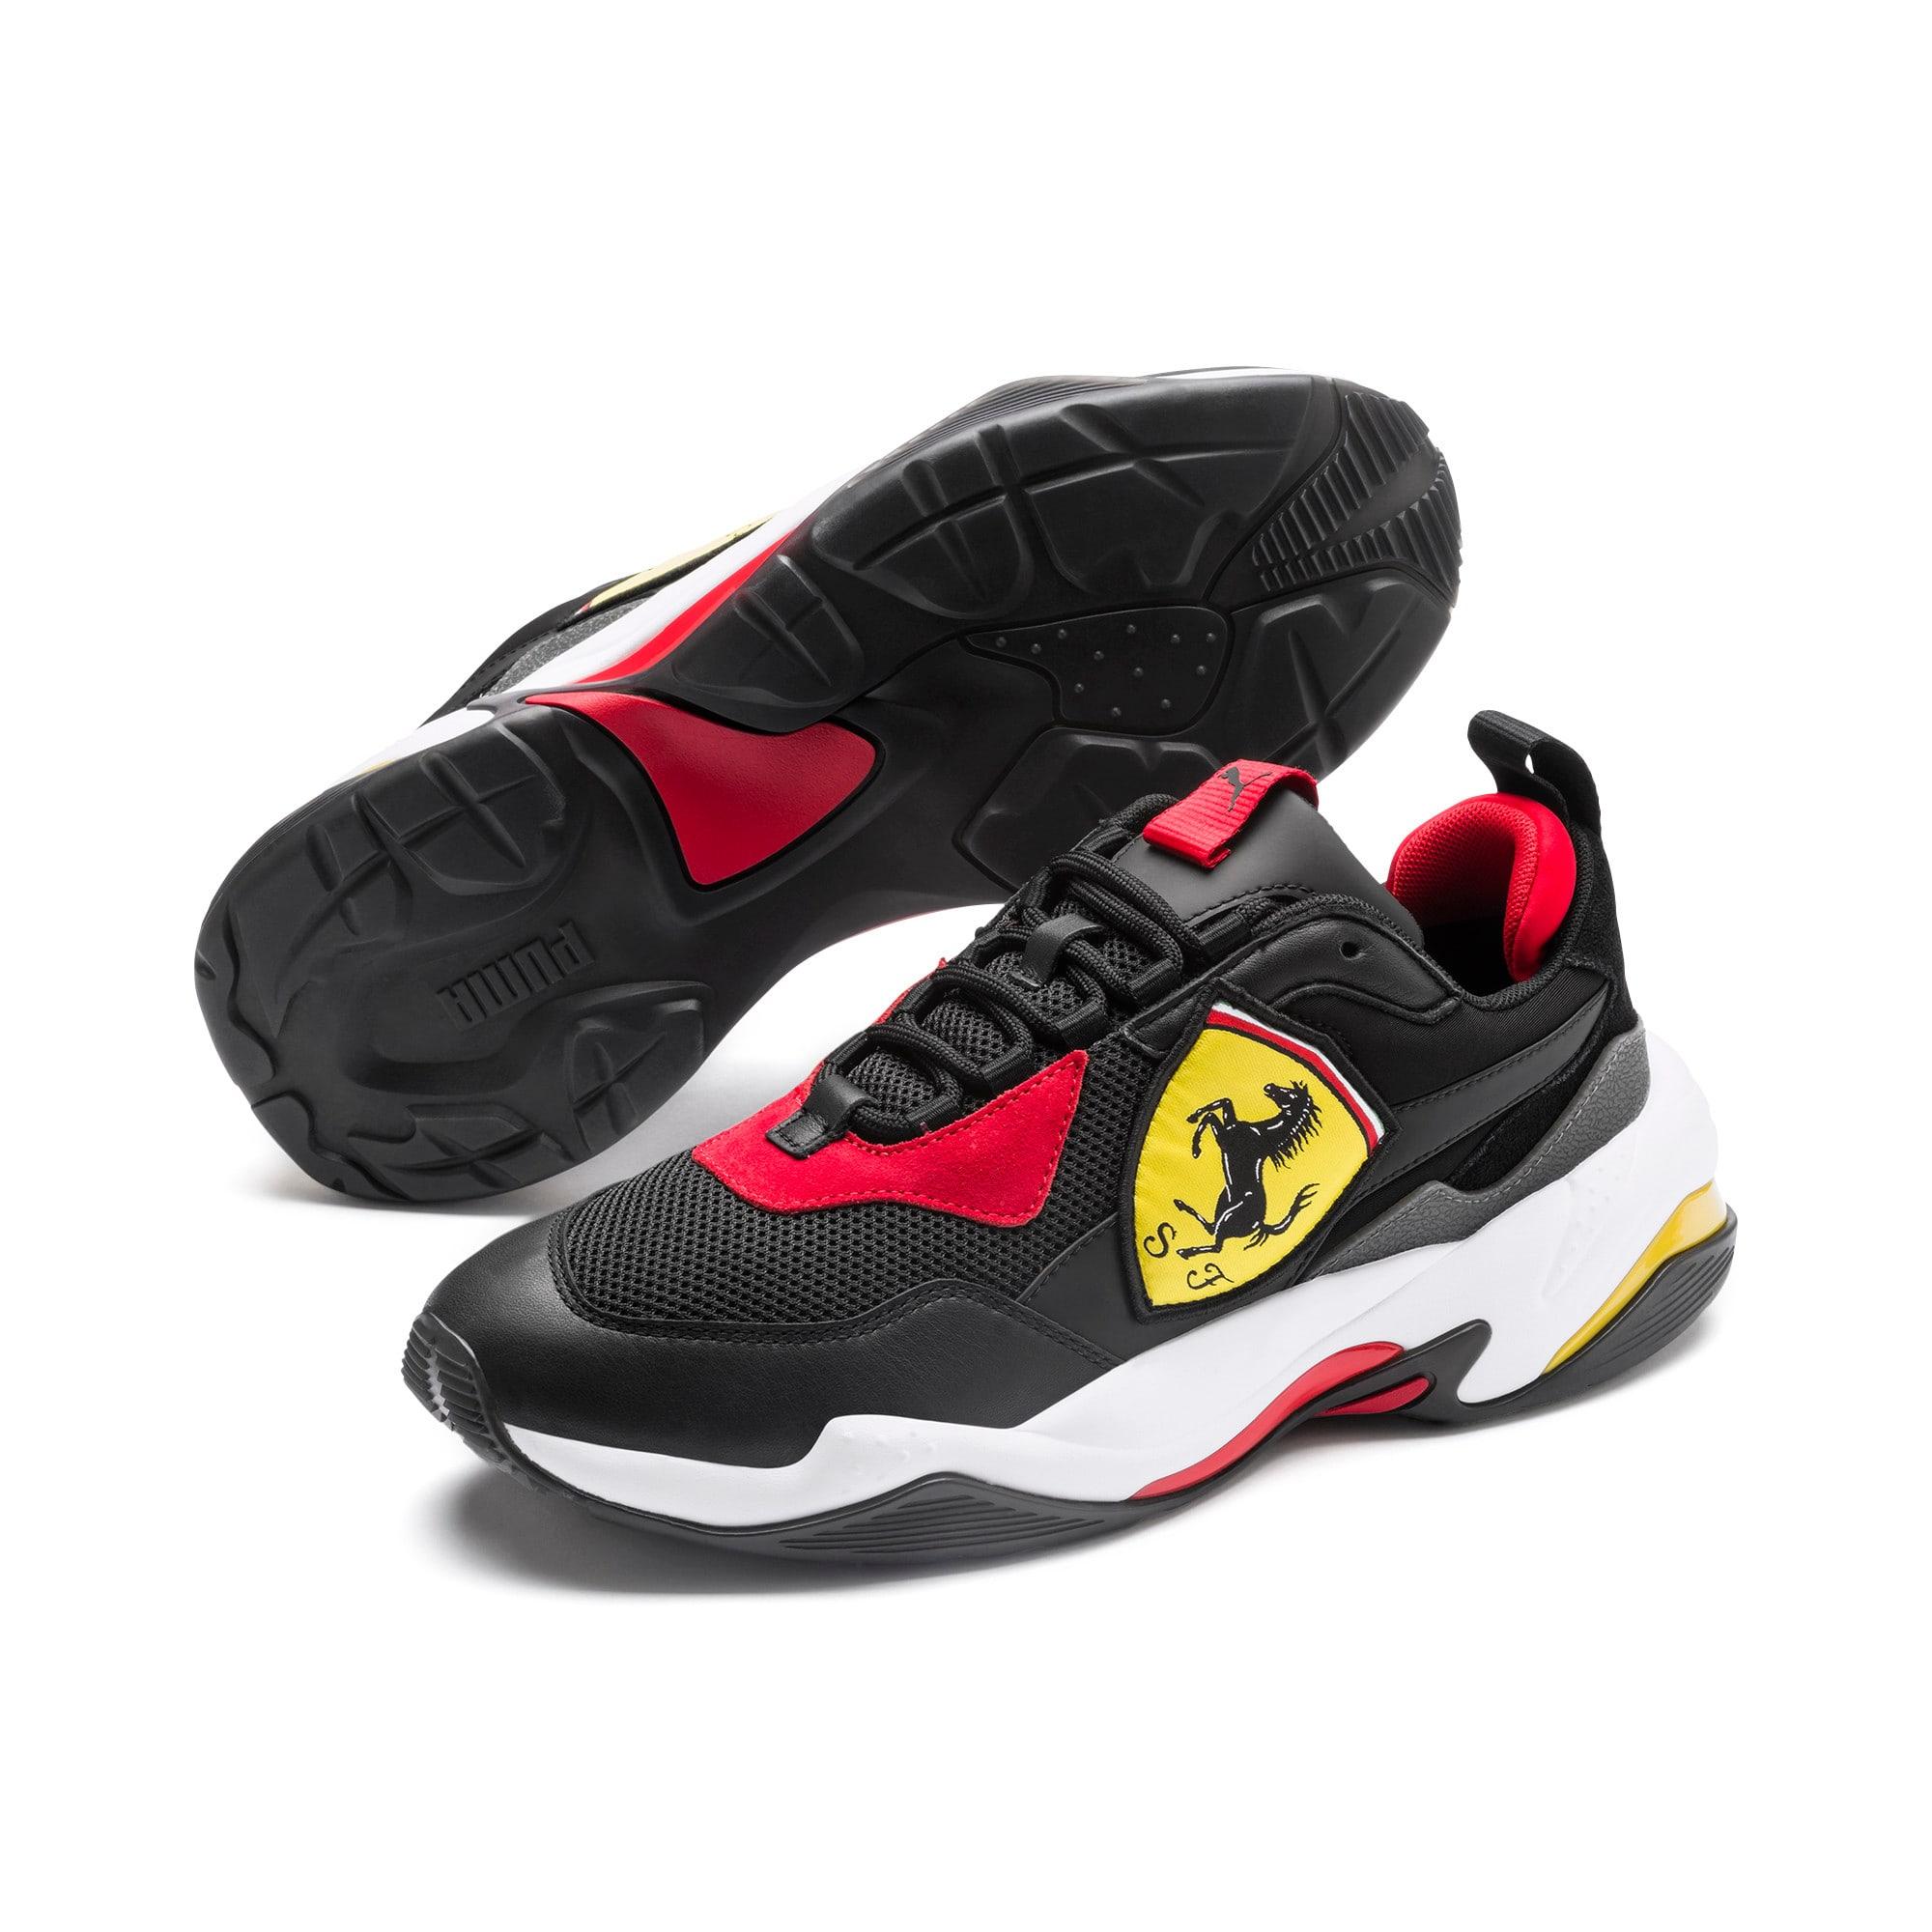 Thumbnail 2 of Ferrari Thunder Sneaker, Puma Black-Rosso Corsa, medium